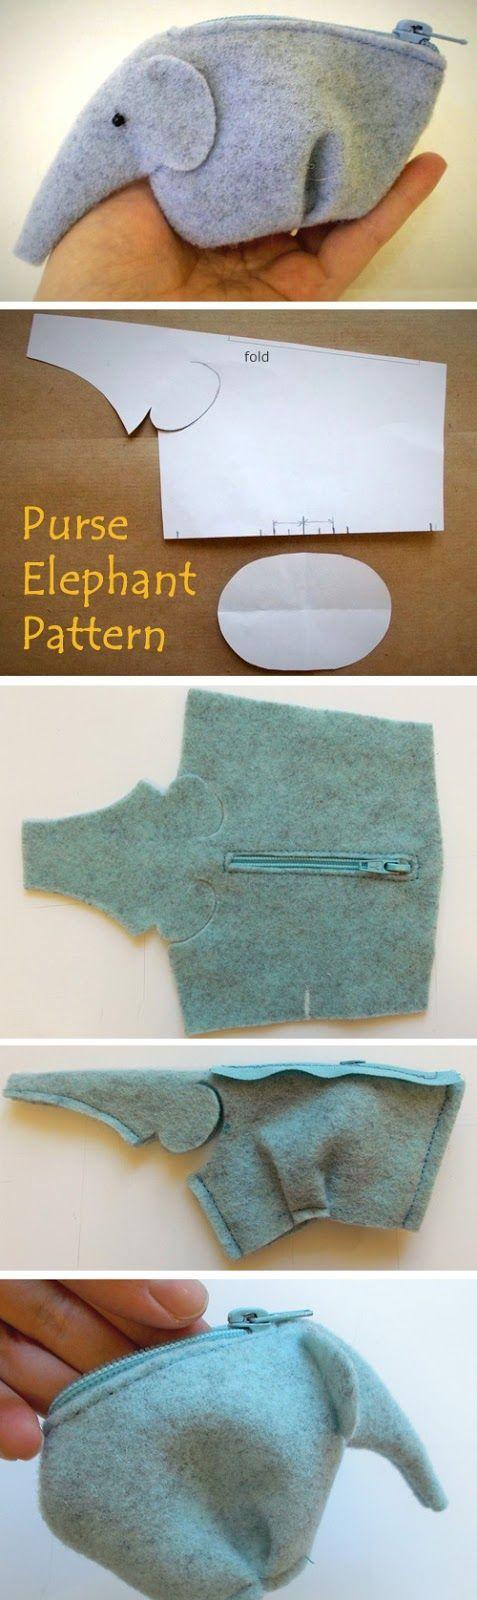 DIY Elephant Purse Tutorial - www.adizzydaisy.com